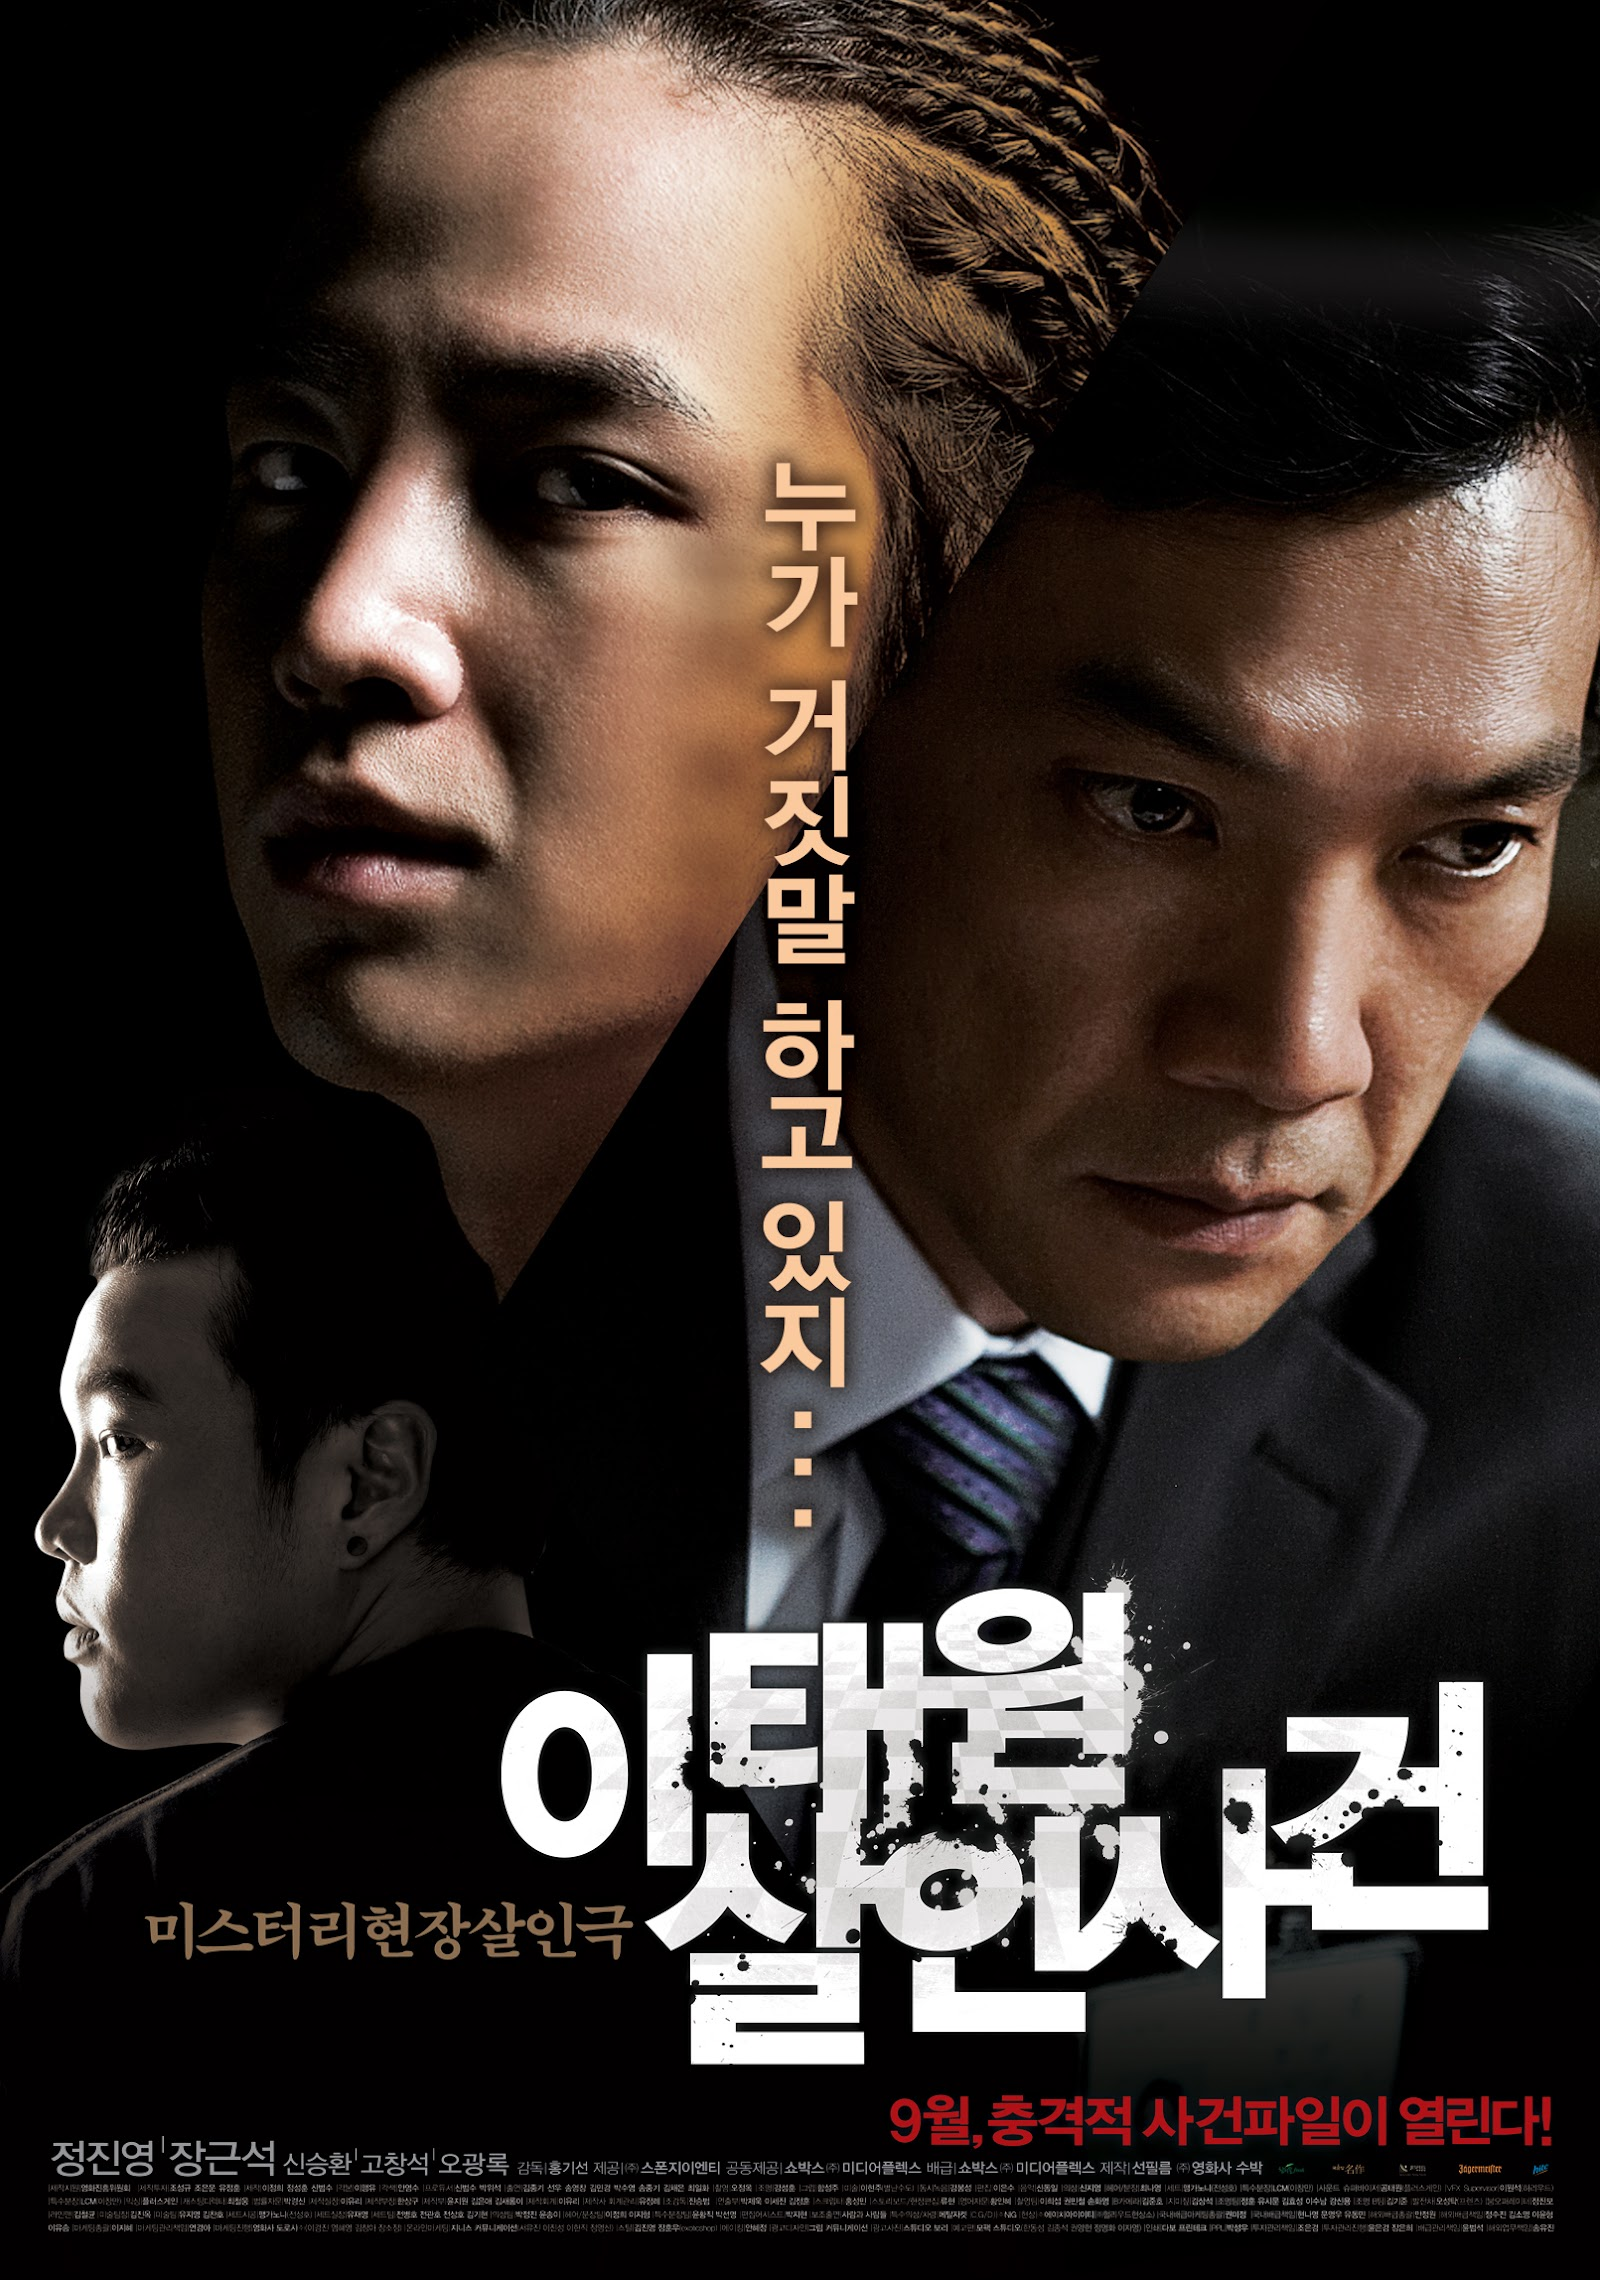 the crucible korean movie download eng sub